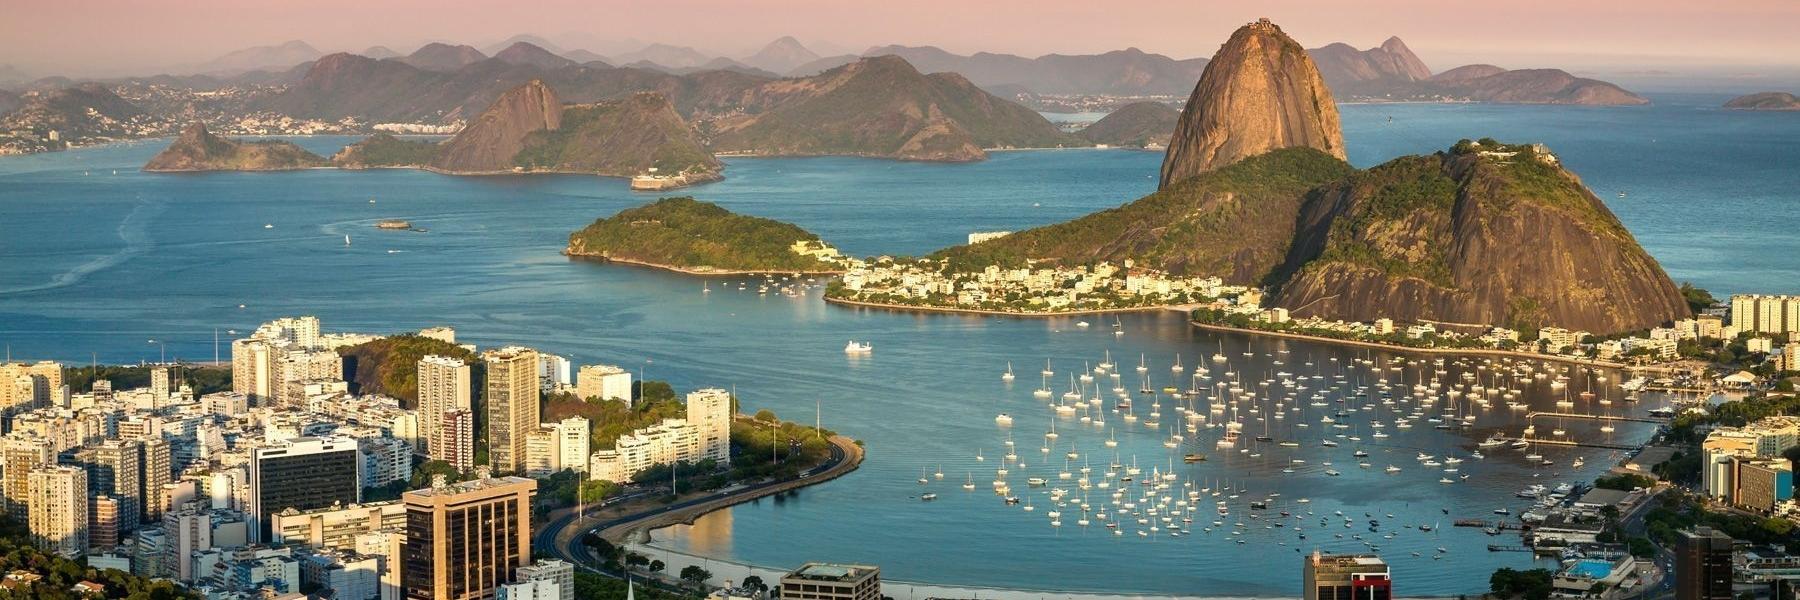 https://gody.vn/blog/visadulichnuocngoai/post/cach-xin-visa-brazil-tu-tuc-khong-qua-kho-nhung-hoi-phuc-tap-6346